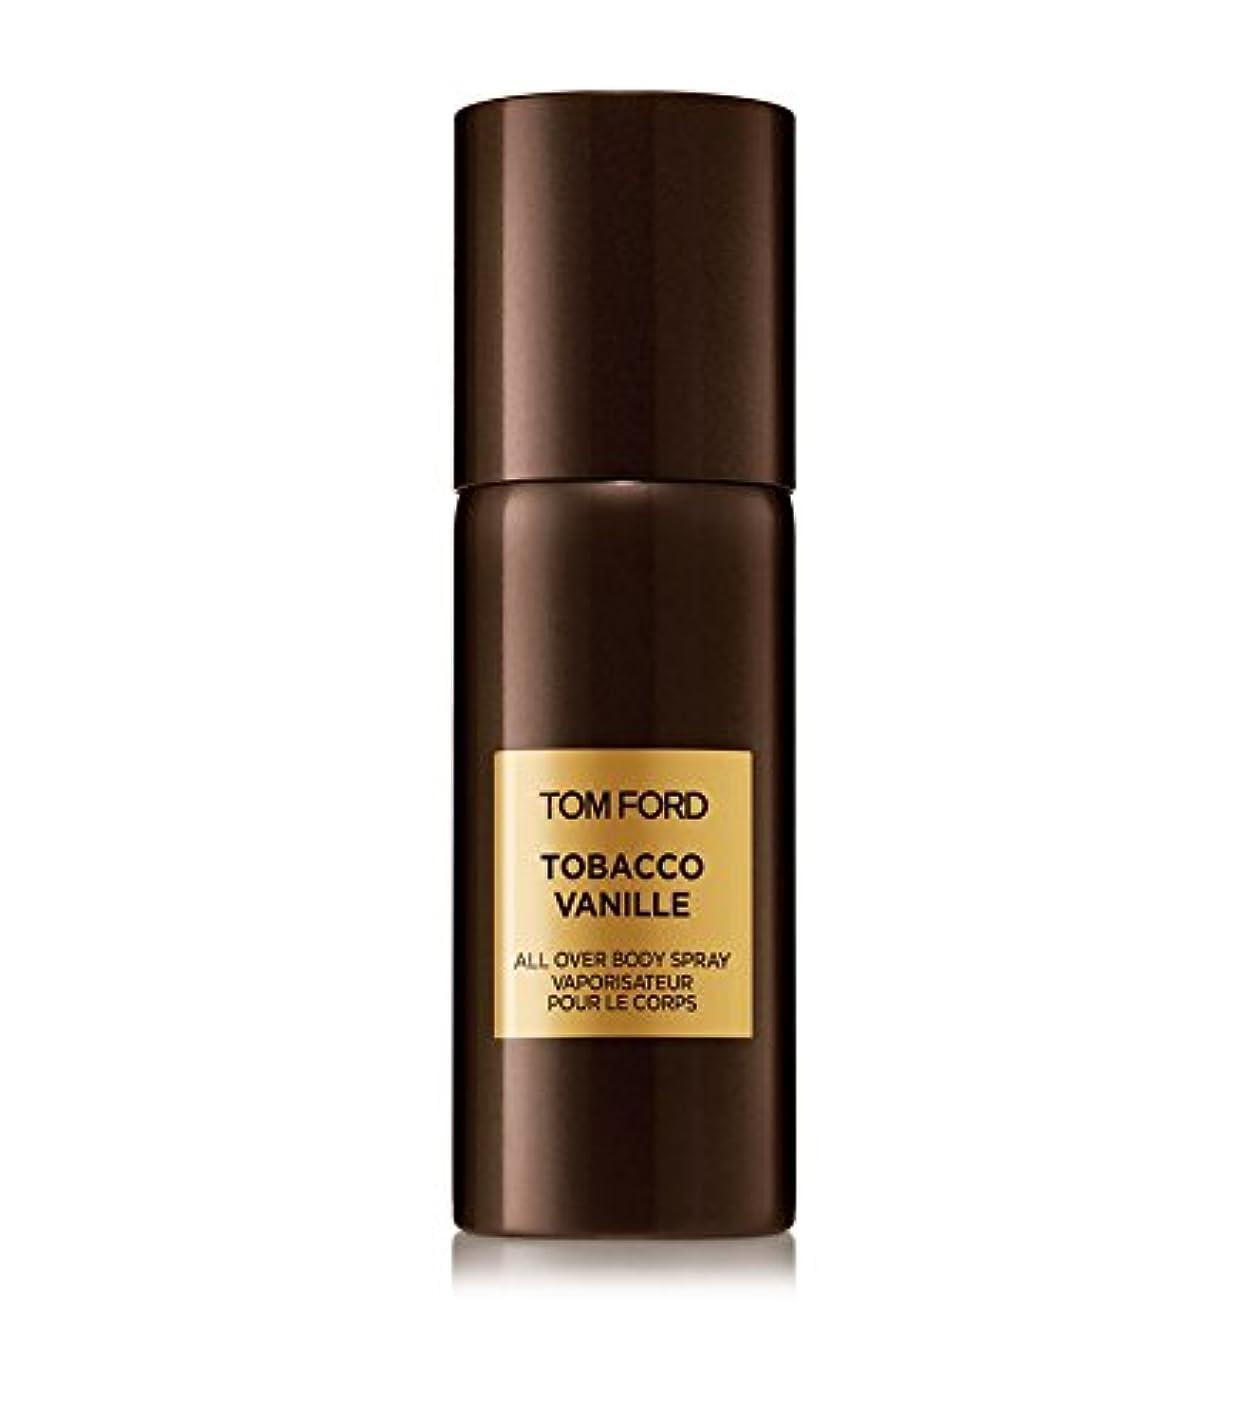 Tom Ford Private Blend 'Tobacco Vanille' (トムフォード プライベートブレンド タバコバニラ) 5.0 oz (150ml) All Over Body Spray ボディースプレー